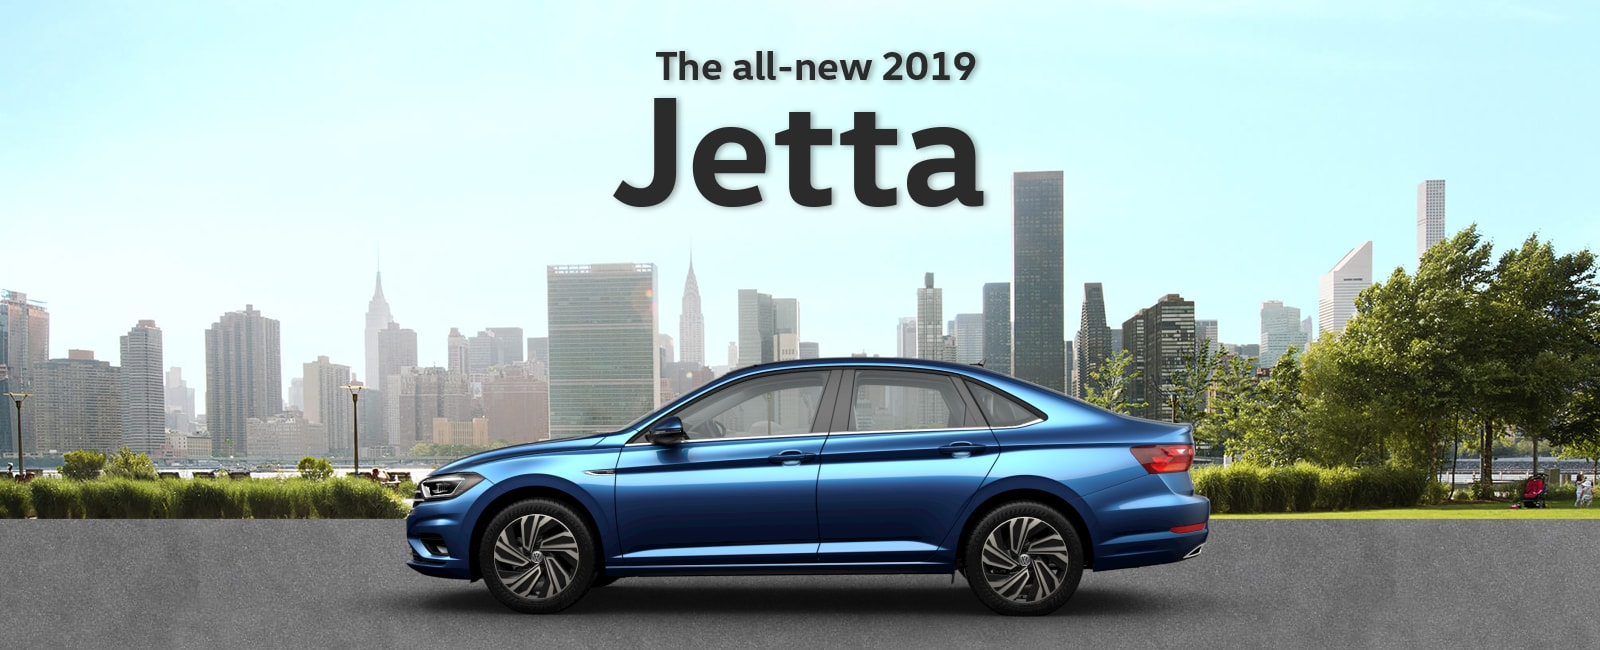 2019 Volkswagen Jetta   Minuteman VW   Bedford, MA